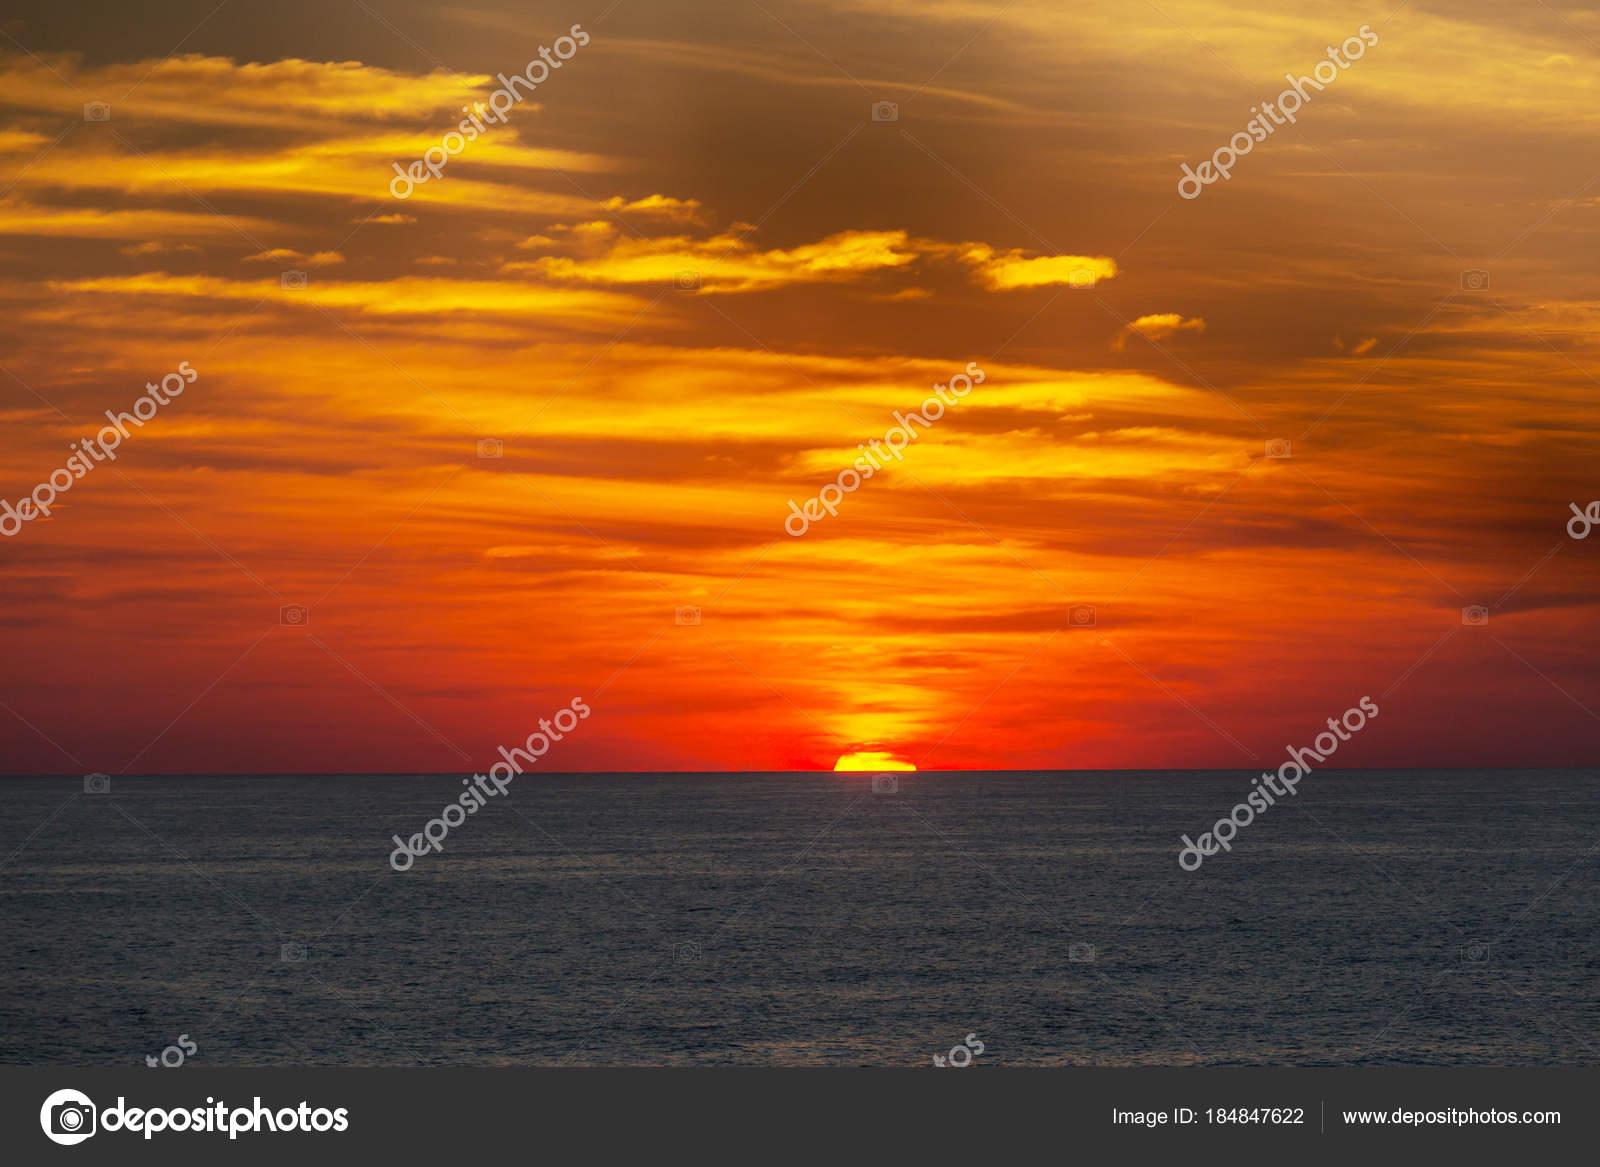 Scenic Colorful Sunset Sea Coast Good Wallpaper Background Image Stock Photo